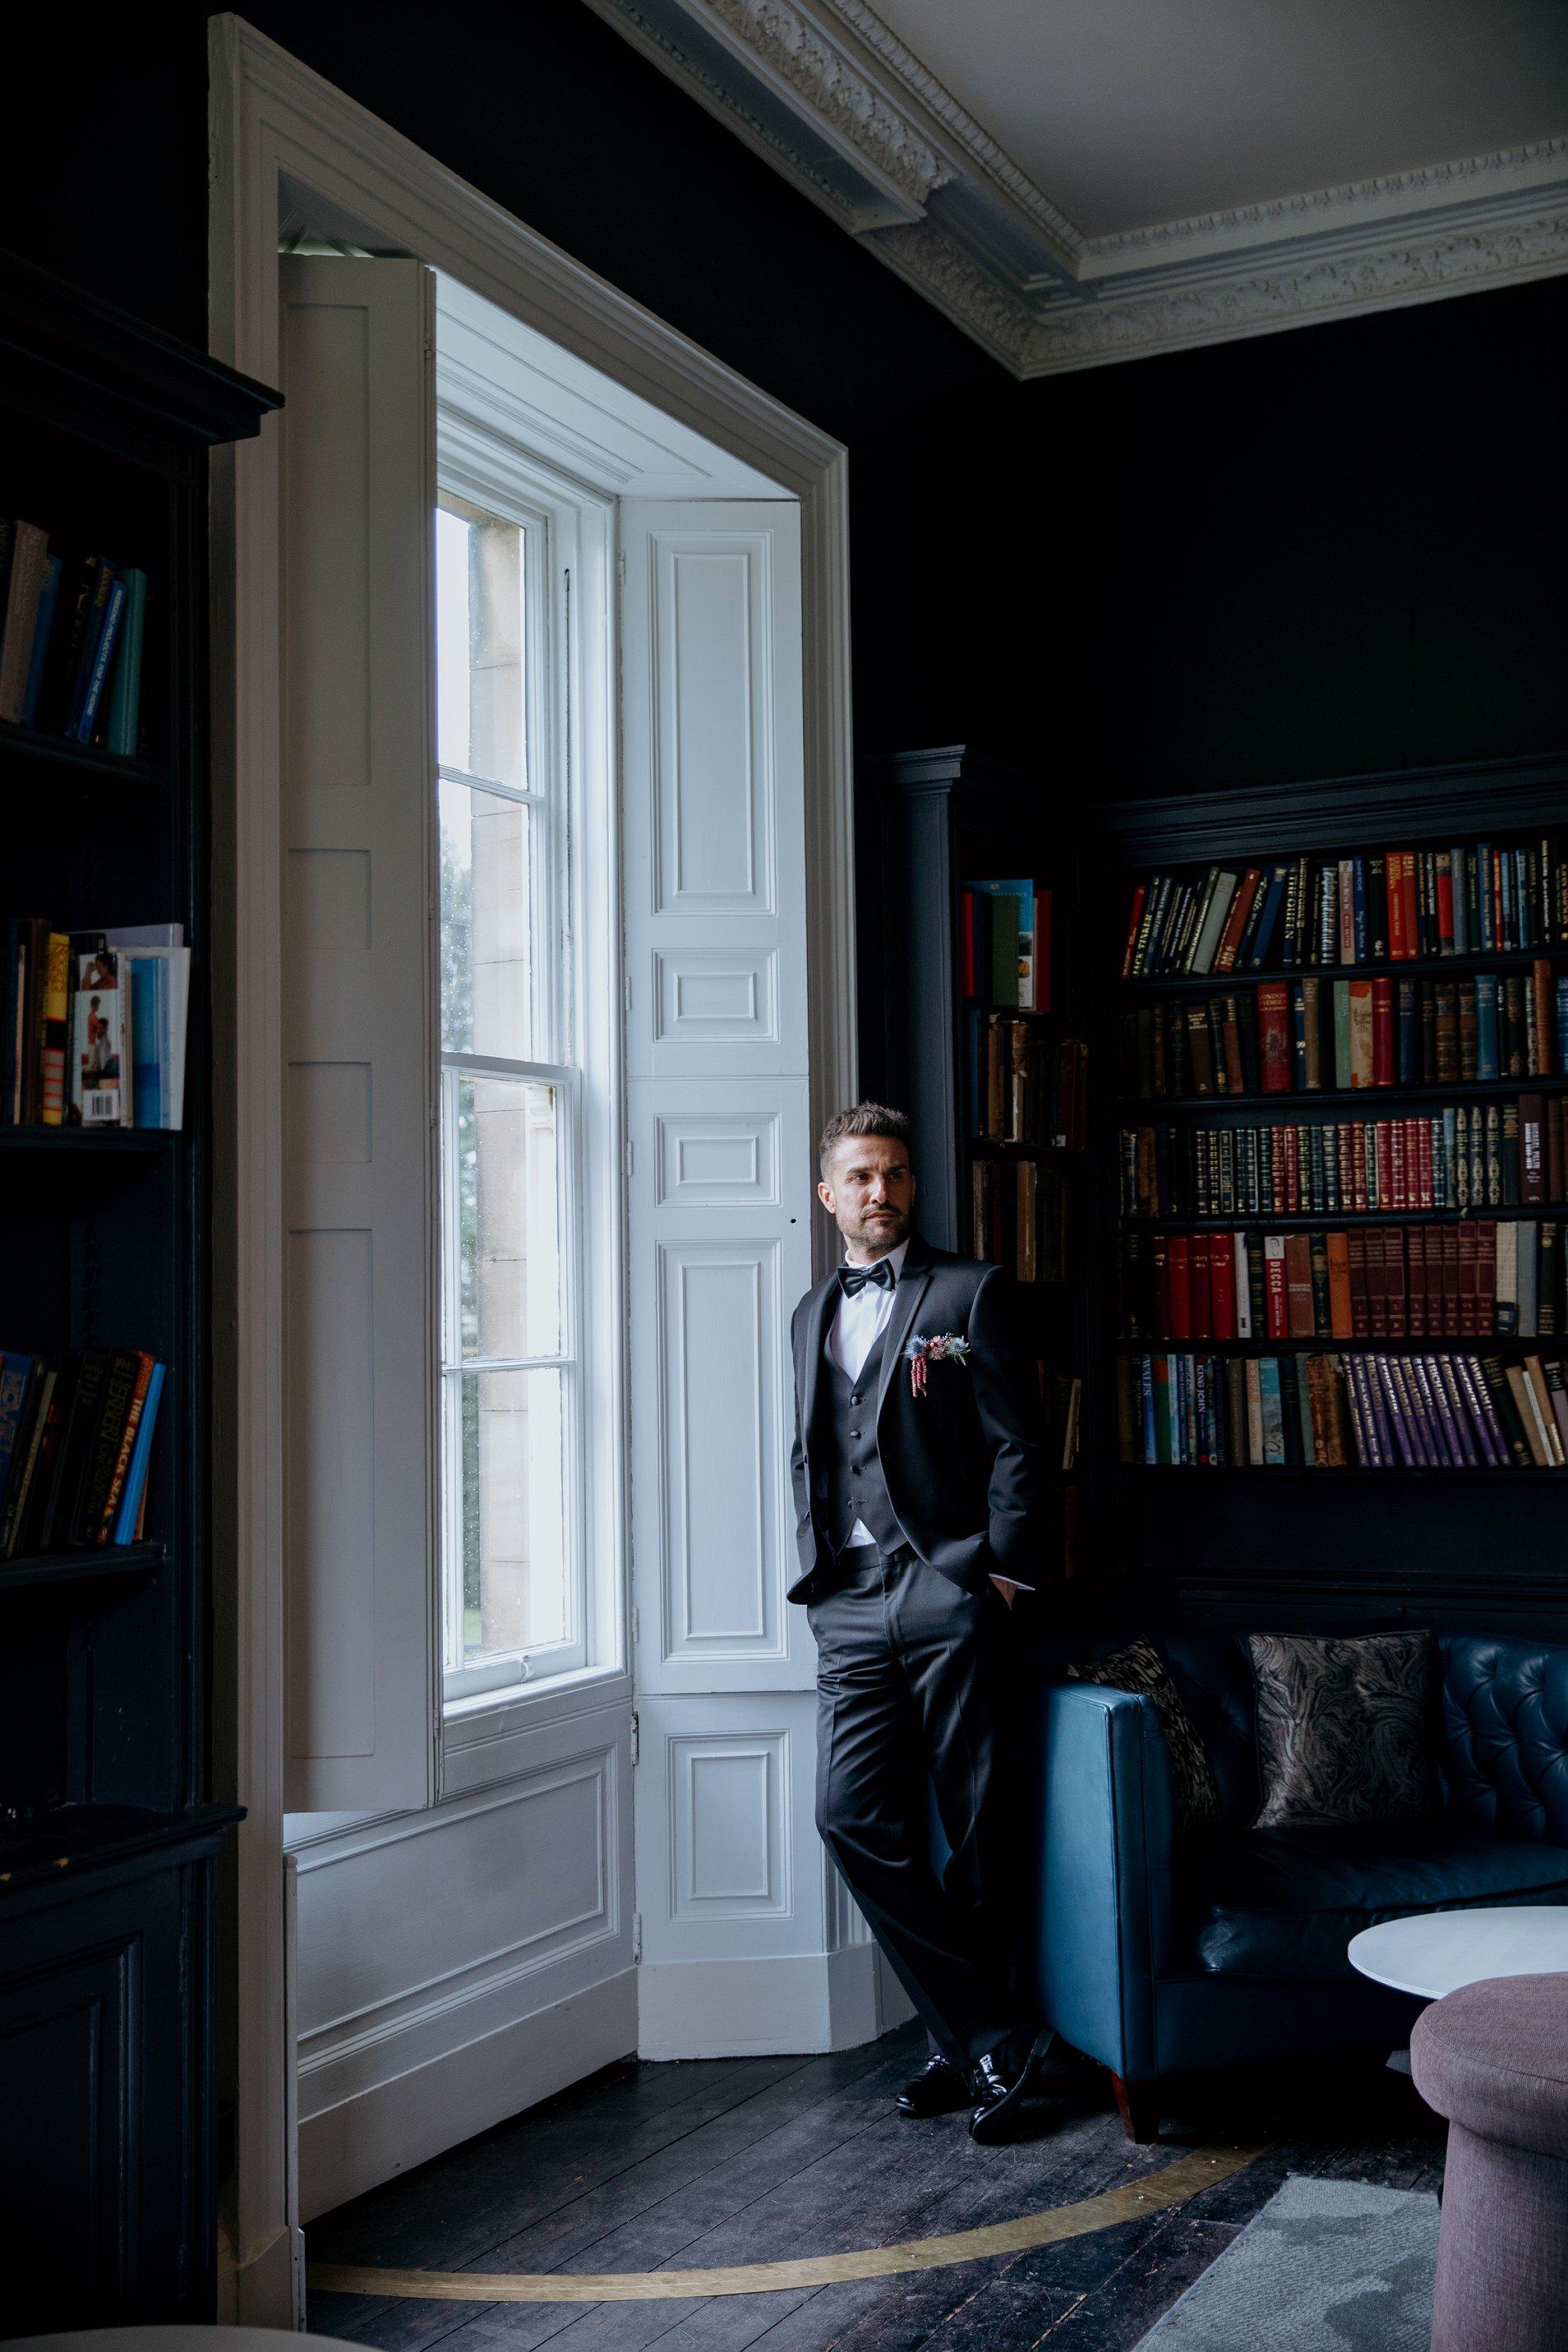 A Black Tie Wedding Creative Shoot at Saltmarshe Hall (c) Natalie Hamilton Photography (32)